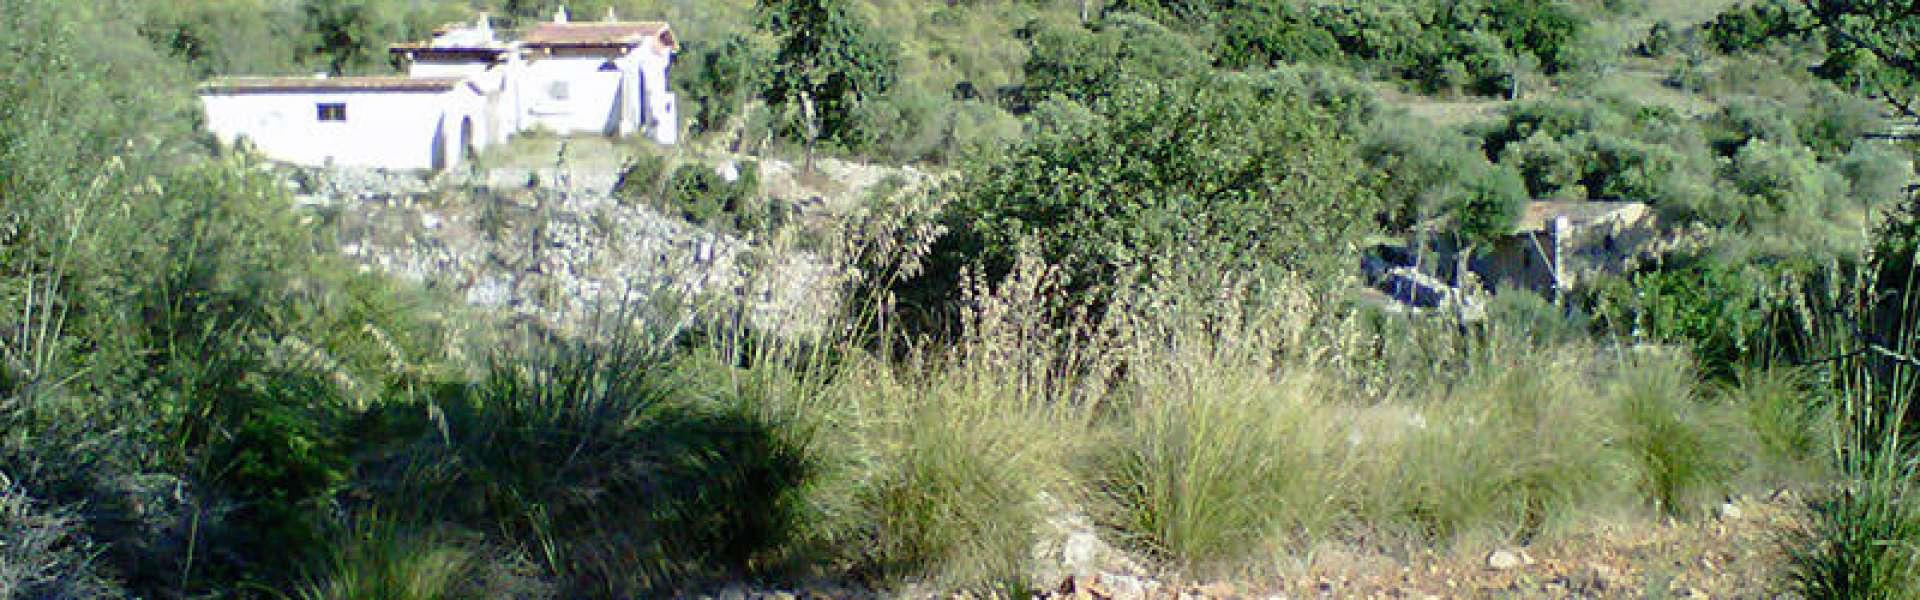 Baugrundstück mit Fincaruine nahe Manacor